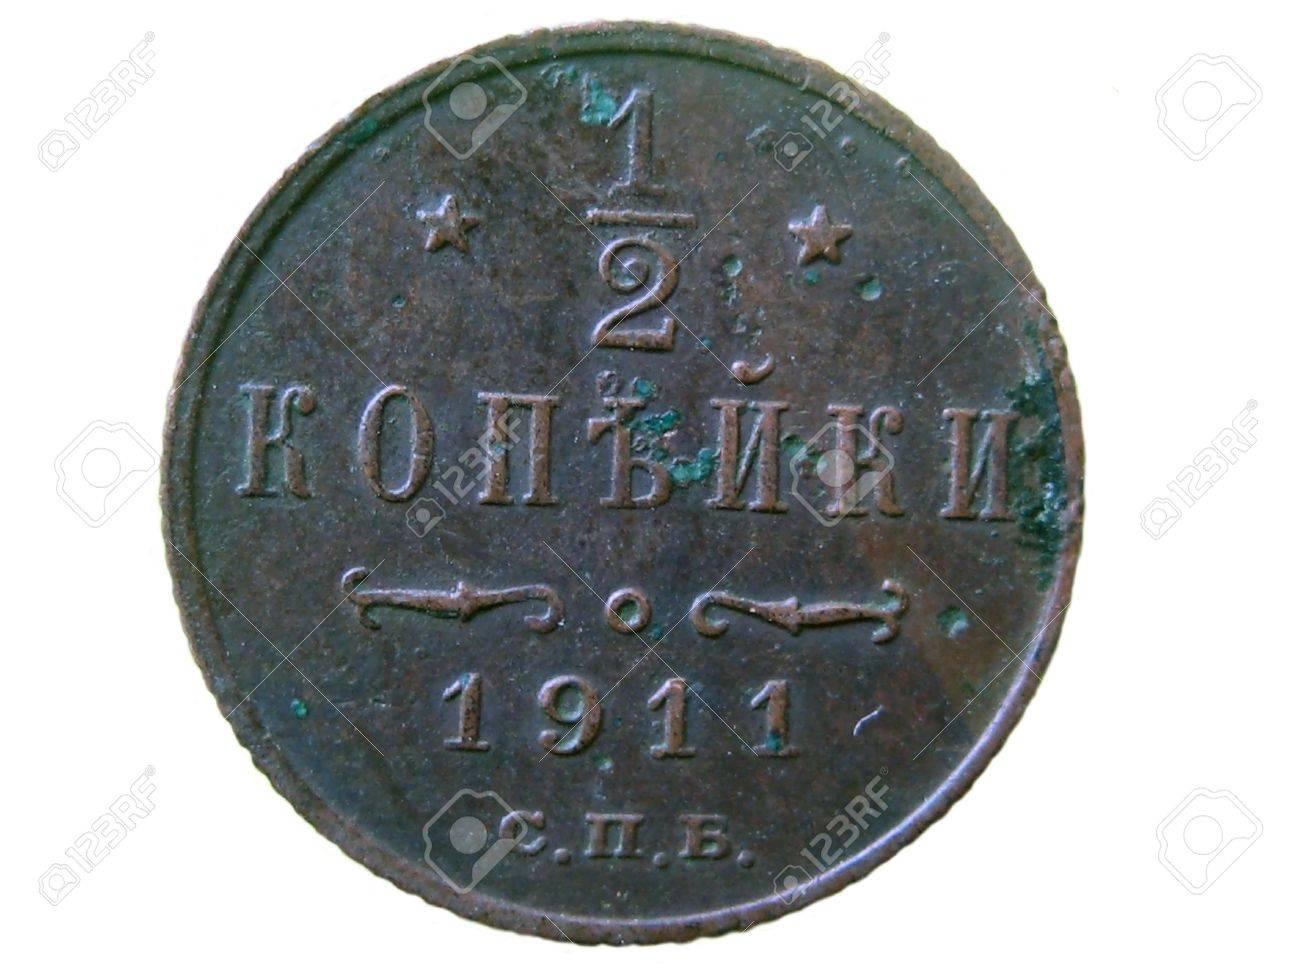 Coins: Ancient Vecchia Moneta